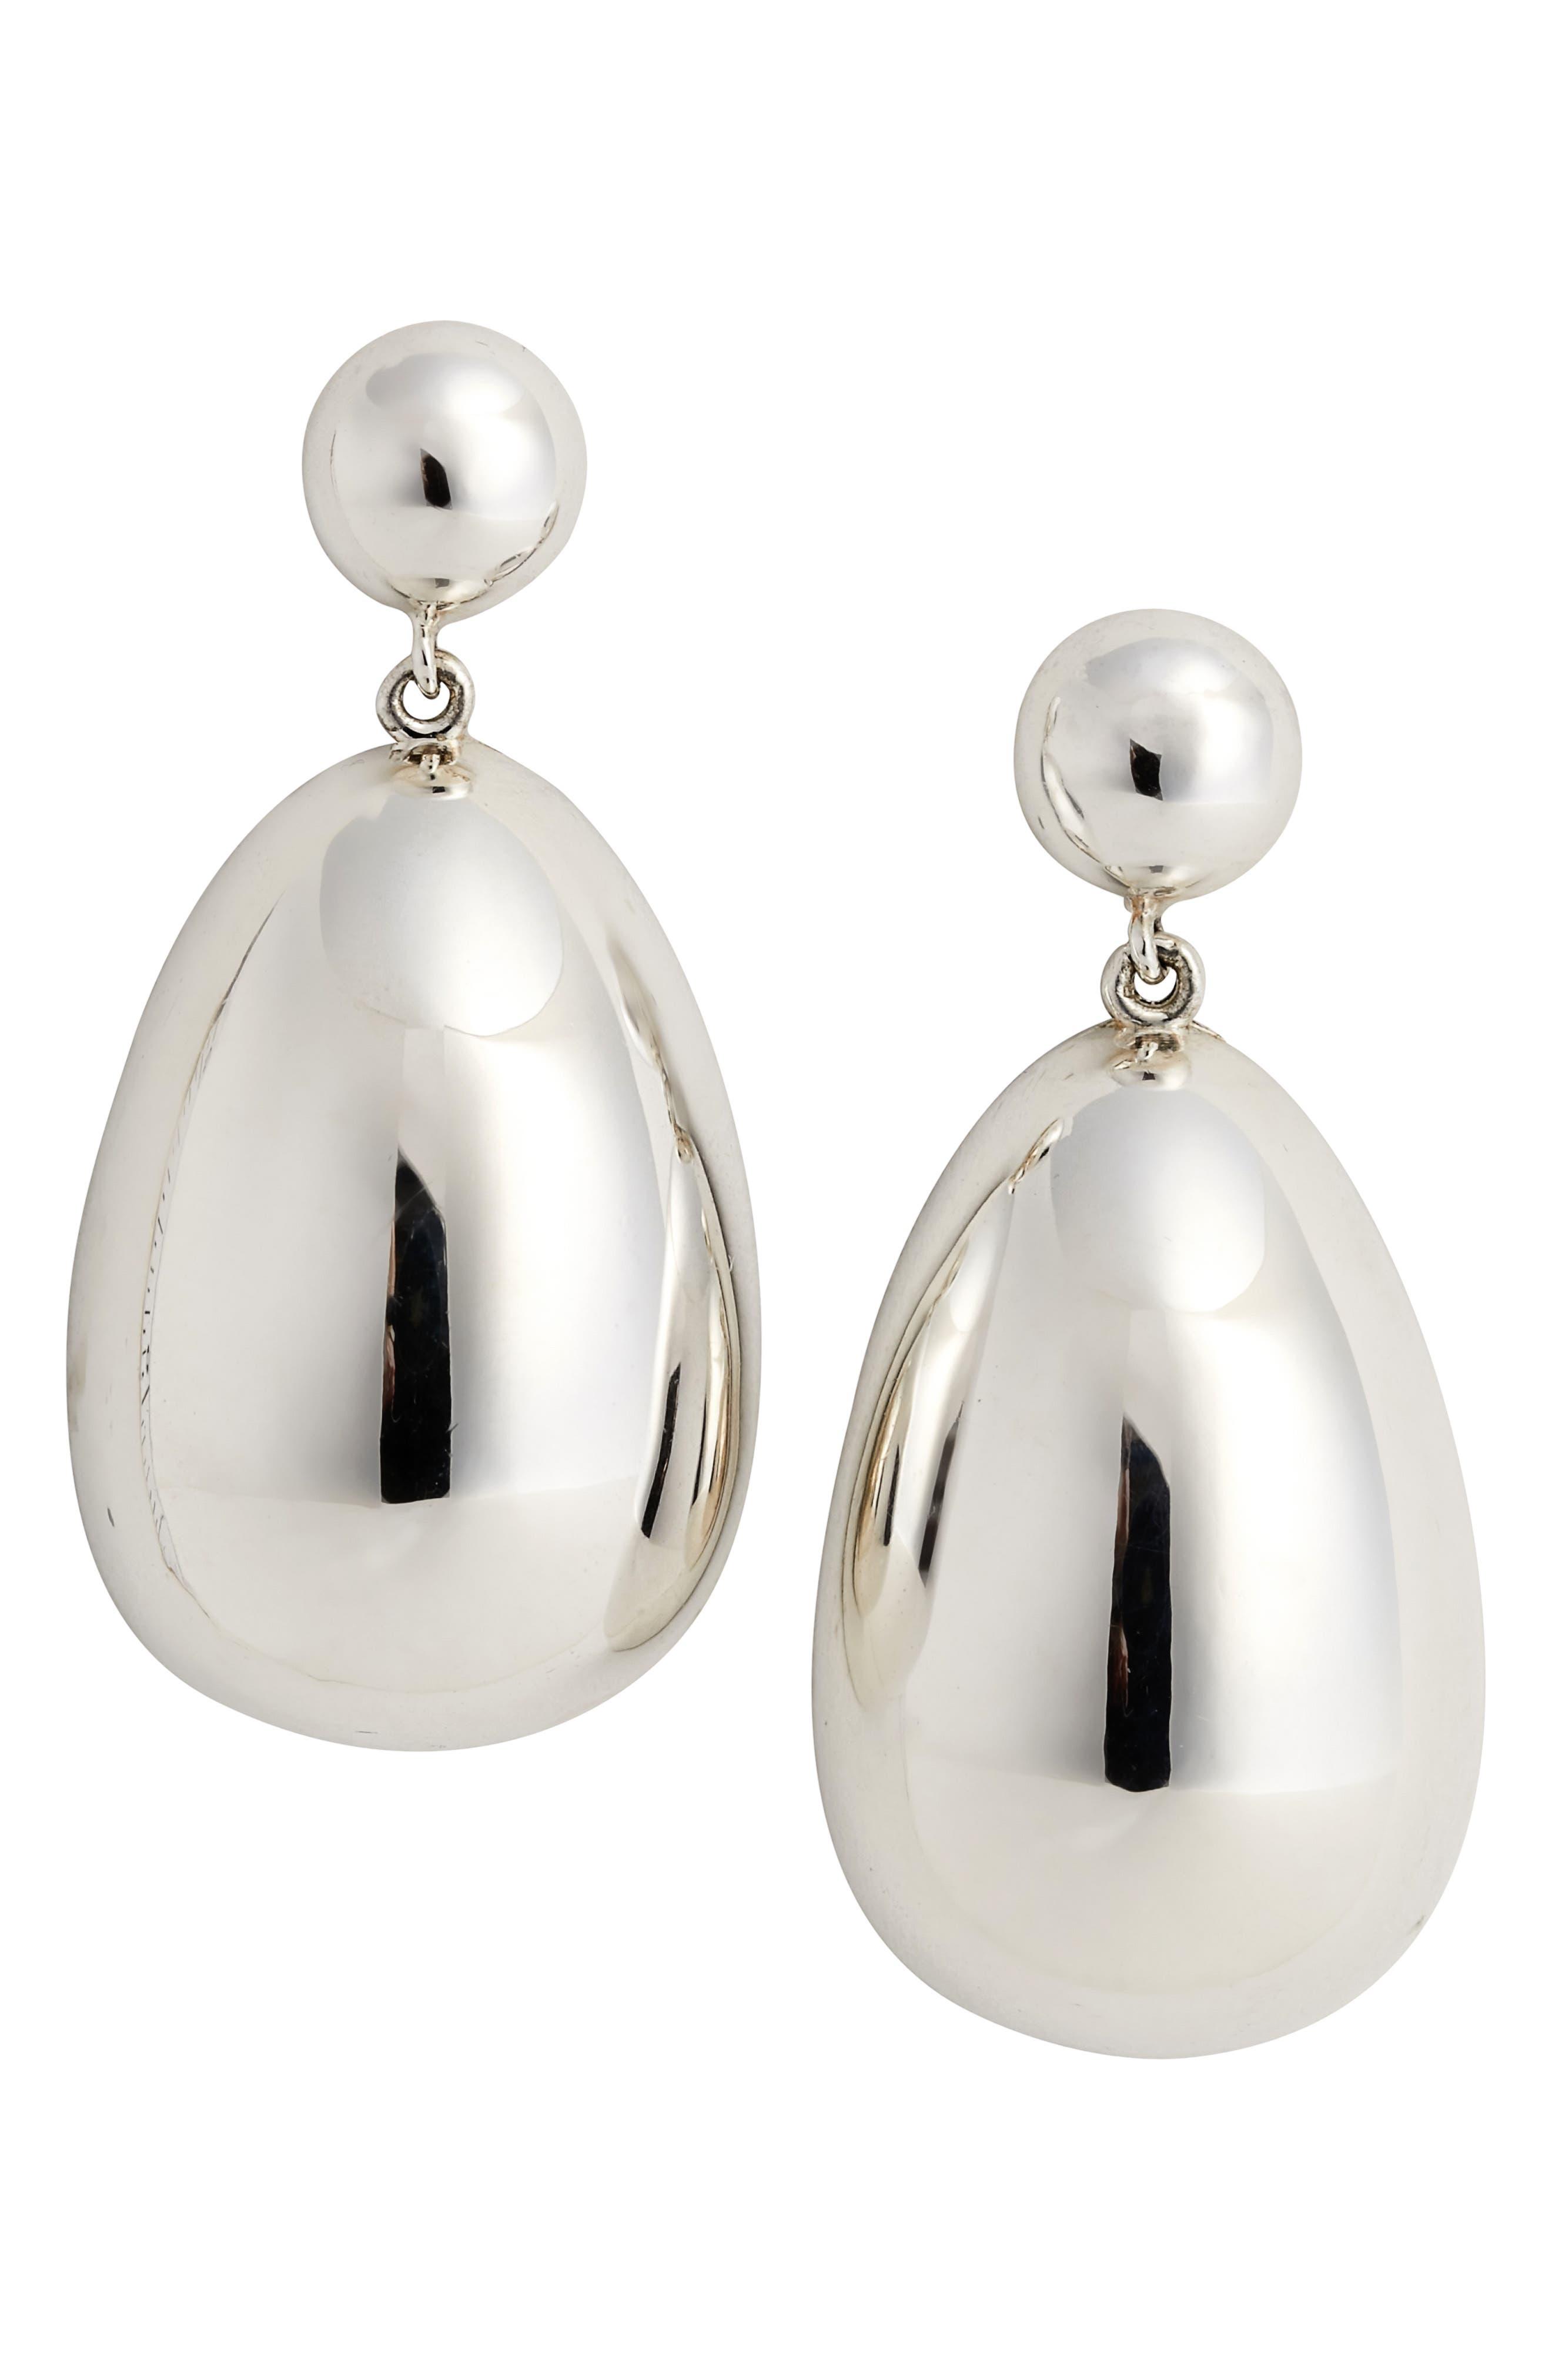 Sophie Buhai Silver Egg Drop Earrings